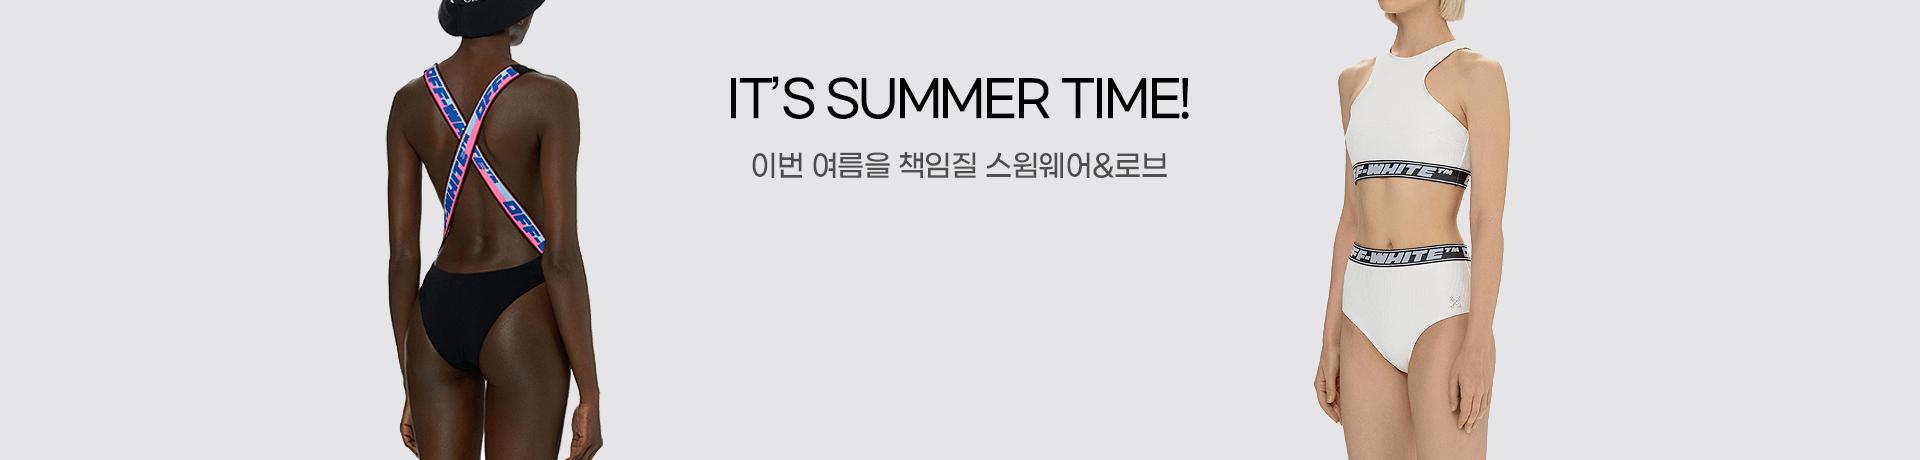 210531_yh_it_s-summertime_pc_e5e5e7_v2